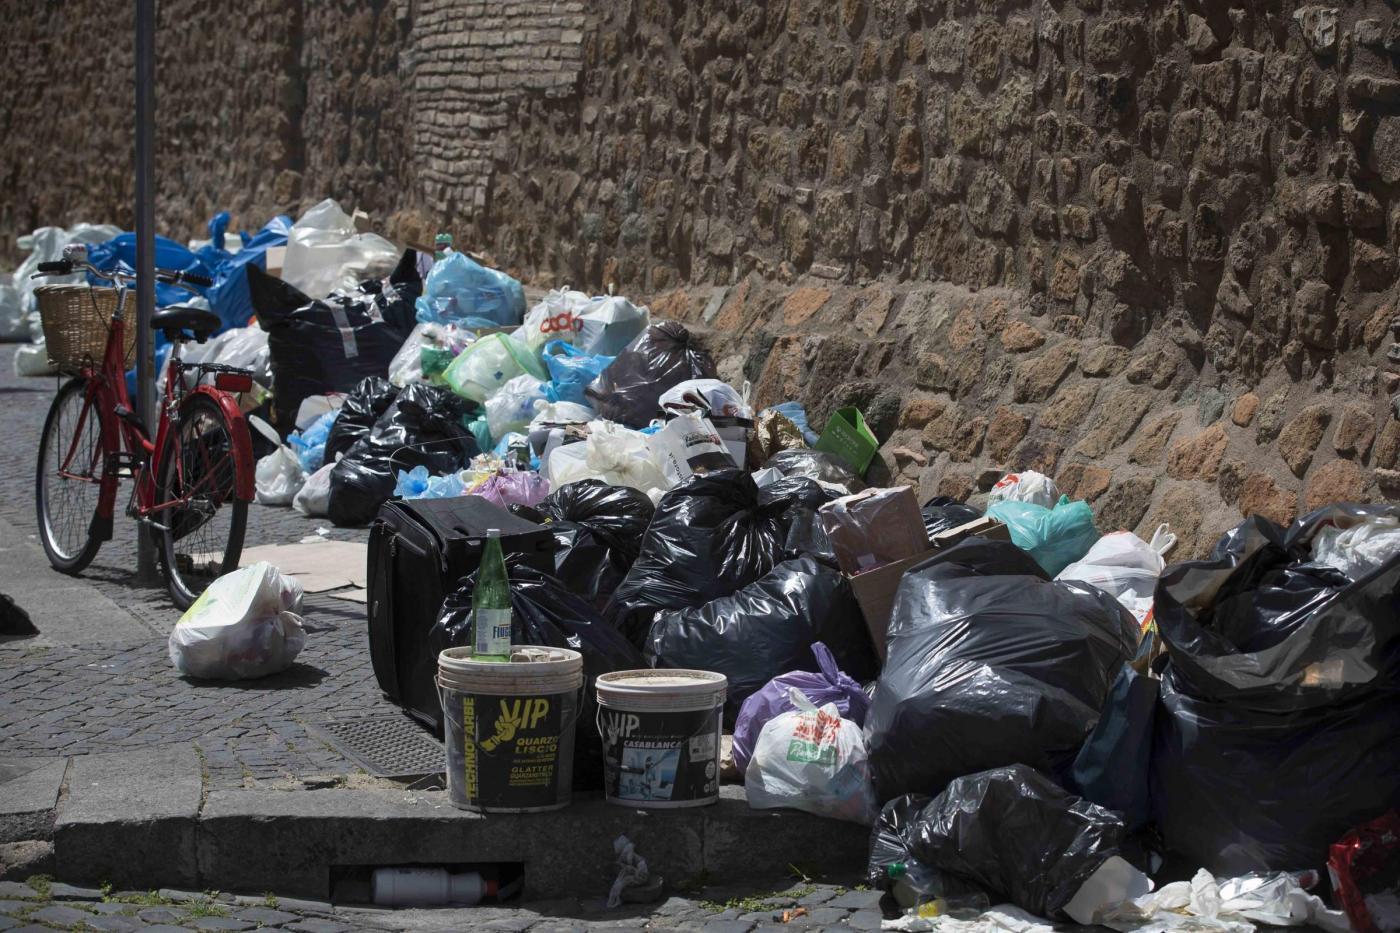 Roma, emergenza rifiuti: bufera sull'assessore M5S